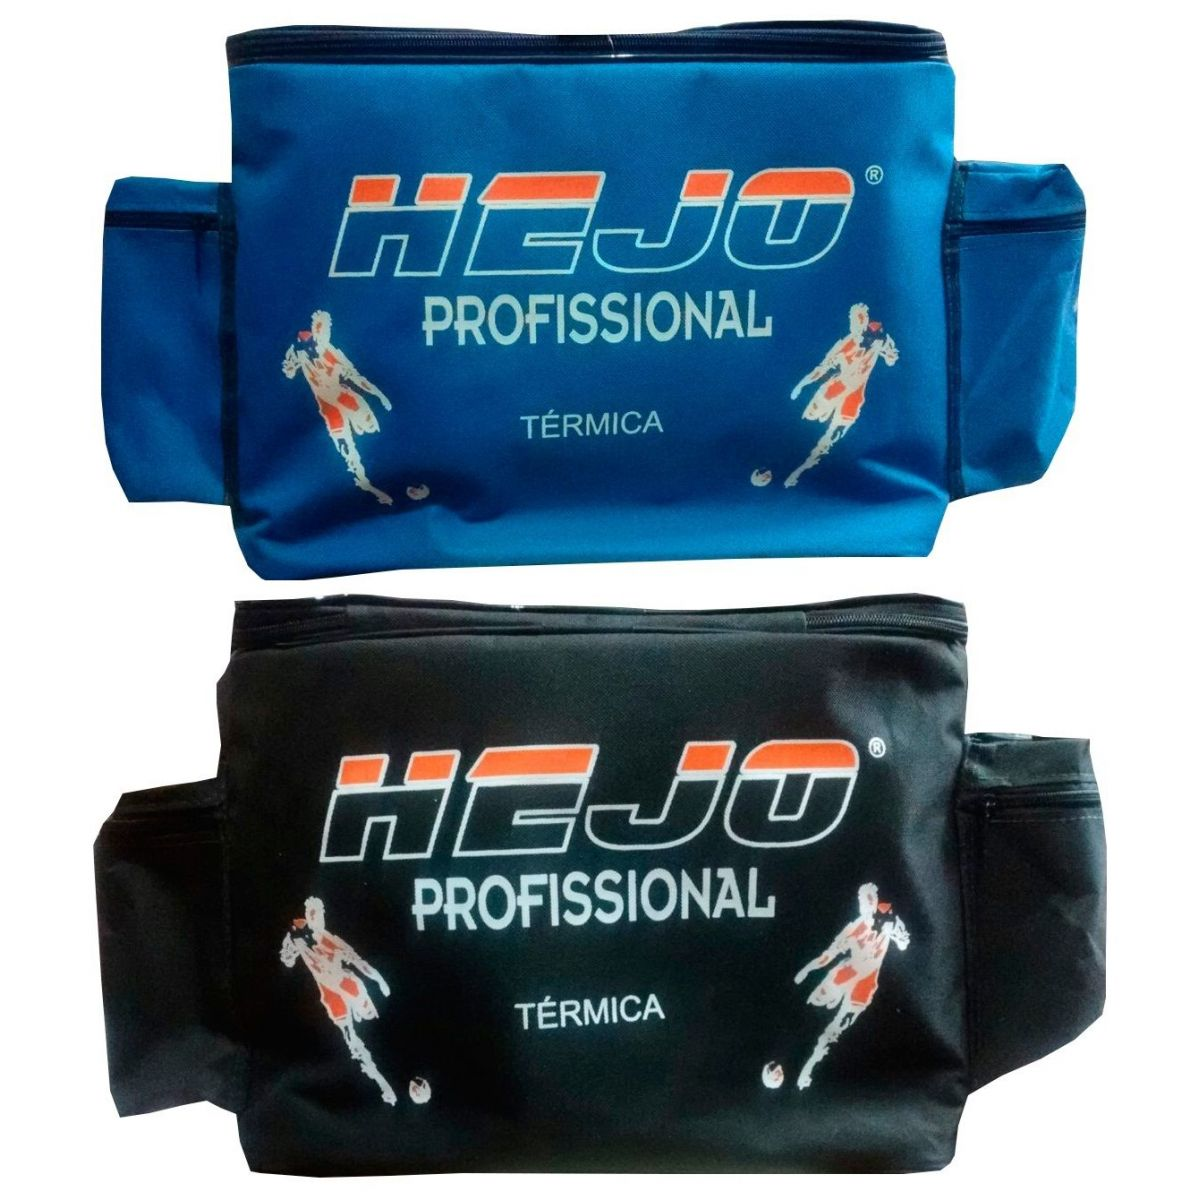 Bolsa Térmica de Massagem modelo Profissional - Hejo